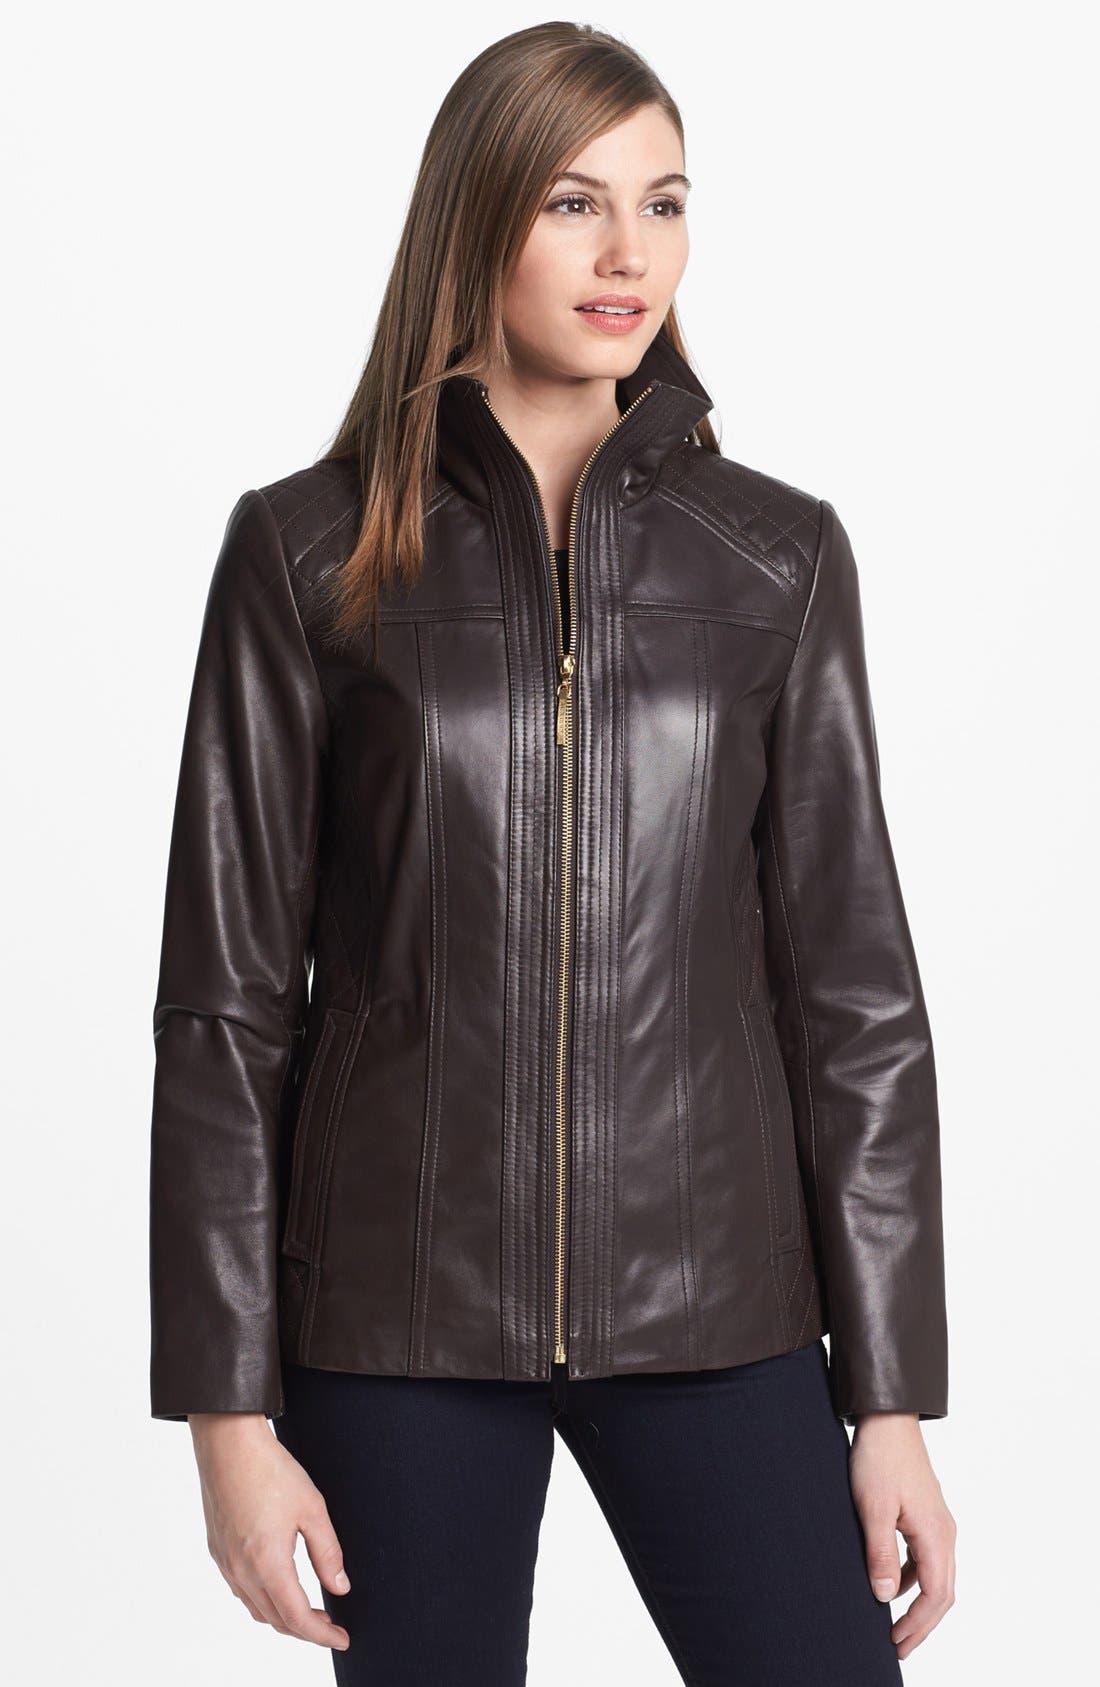 Alternate Image 1 Selected - Ellen Tracy Quilt Trim Leather Jacket